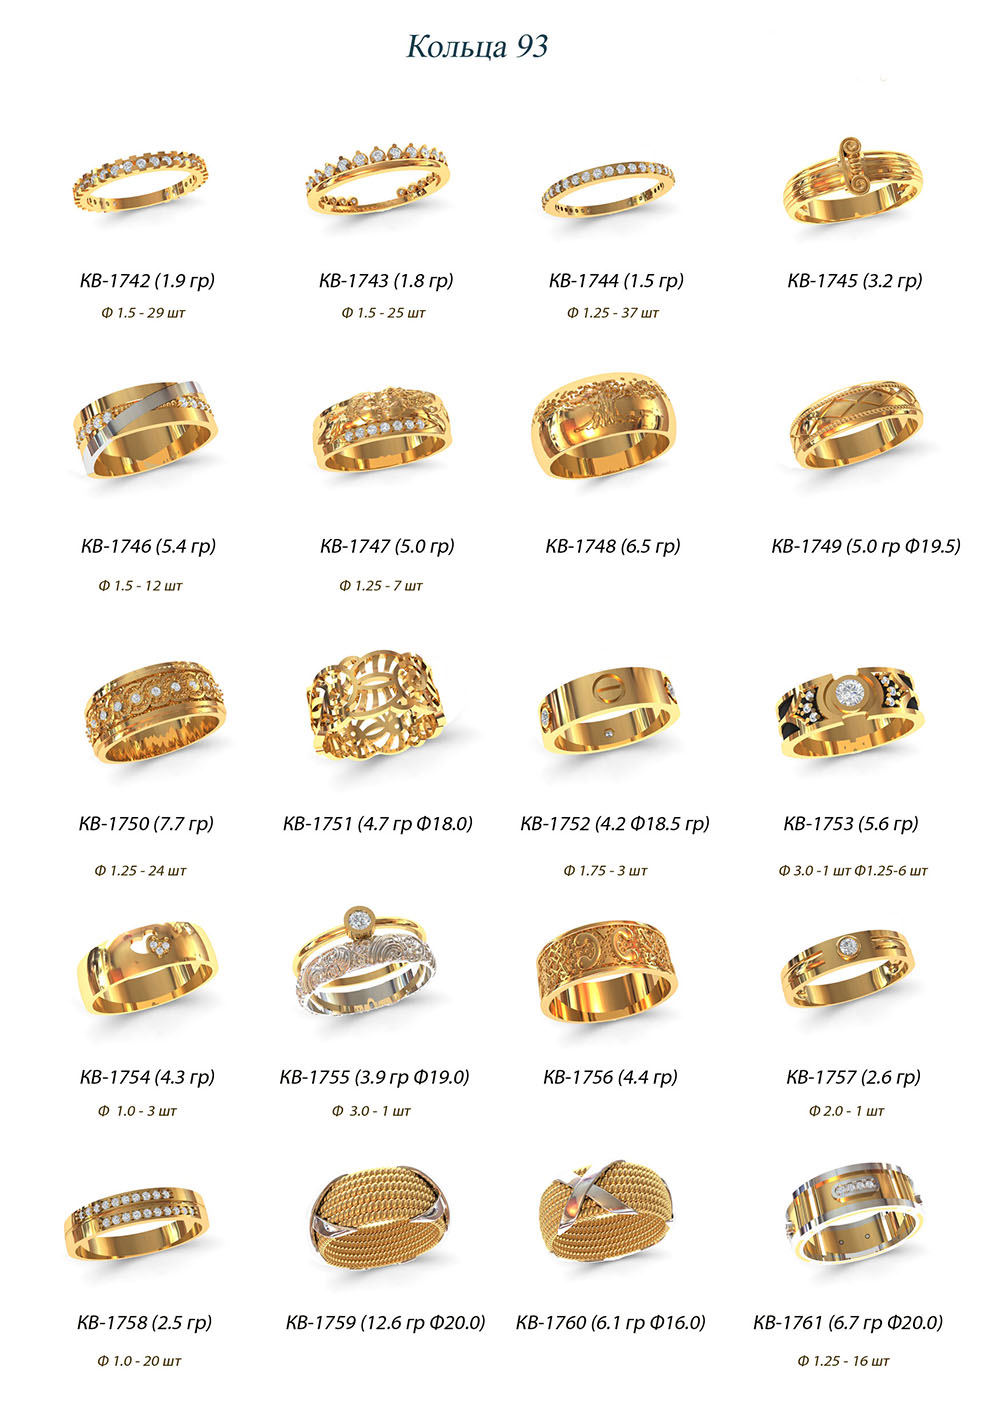 modelit-wax-models-ring-93